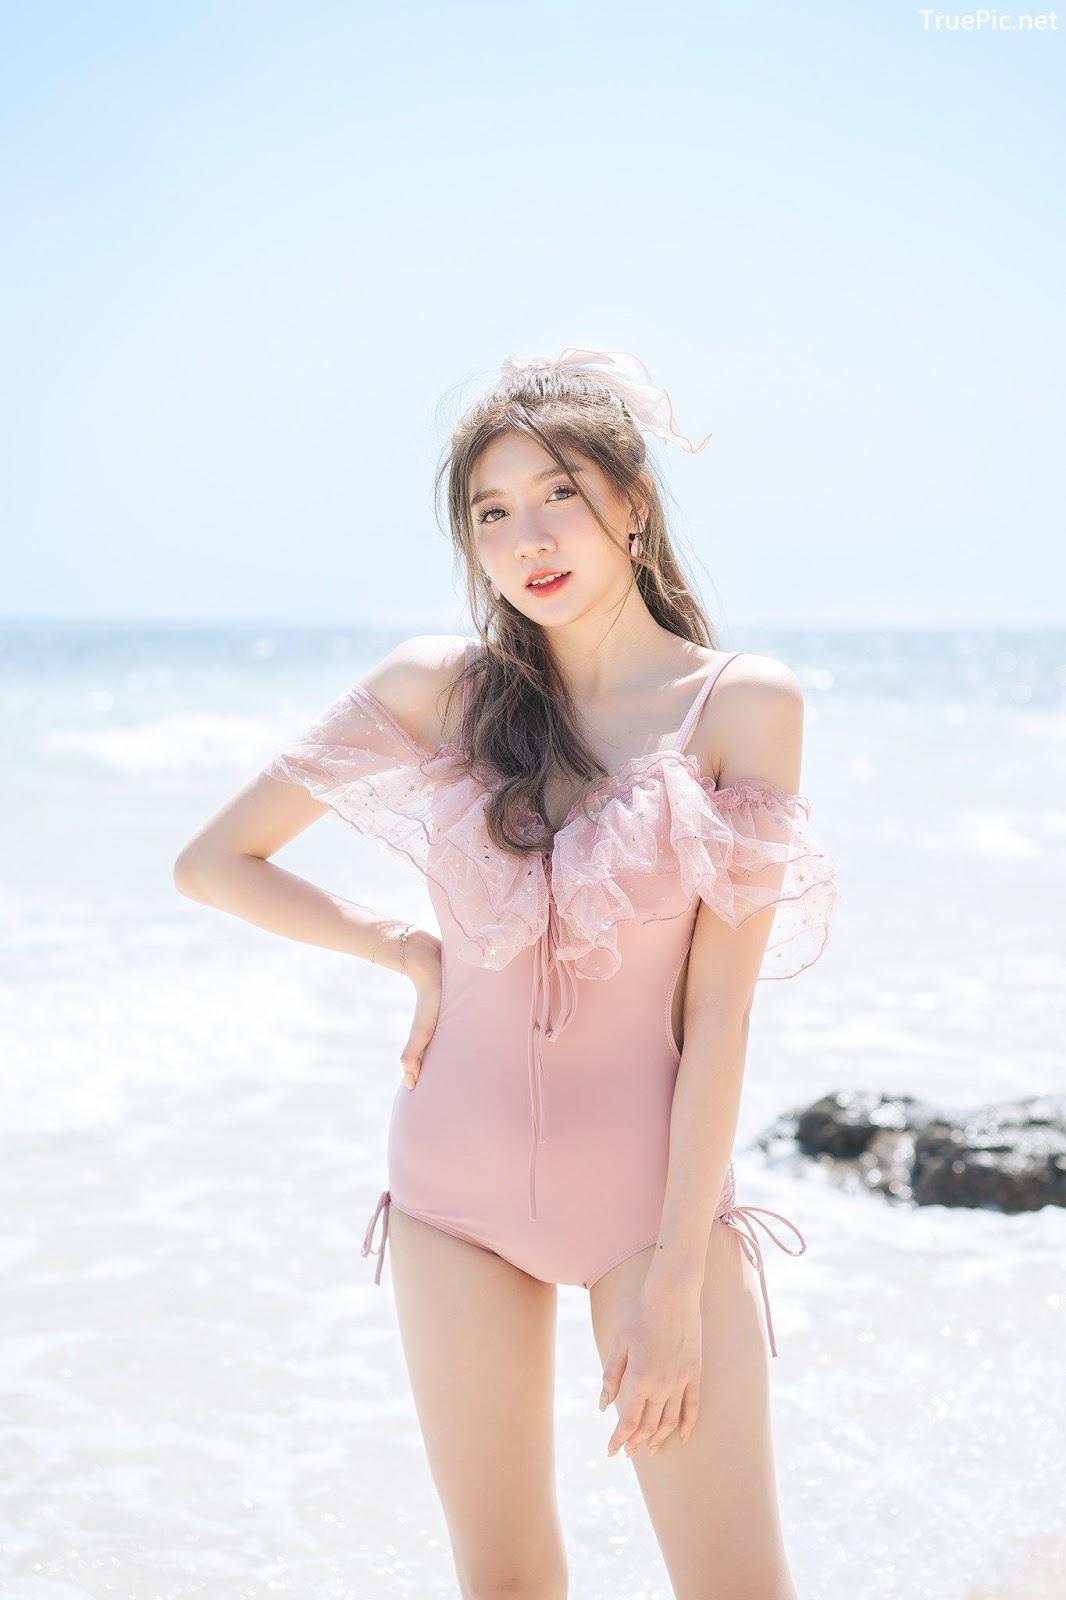 Image Thailand Model - Sasi Ngiunwan - Pink Monokini - TruePic.net - Picture-2